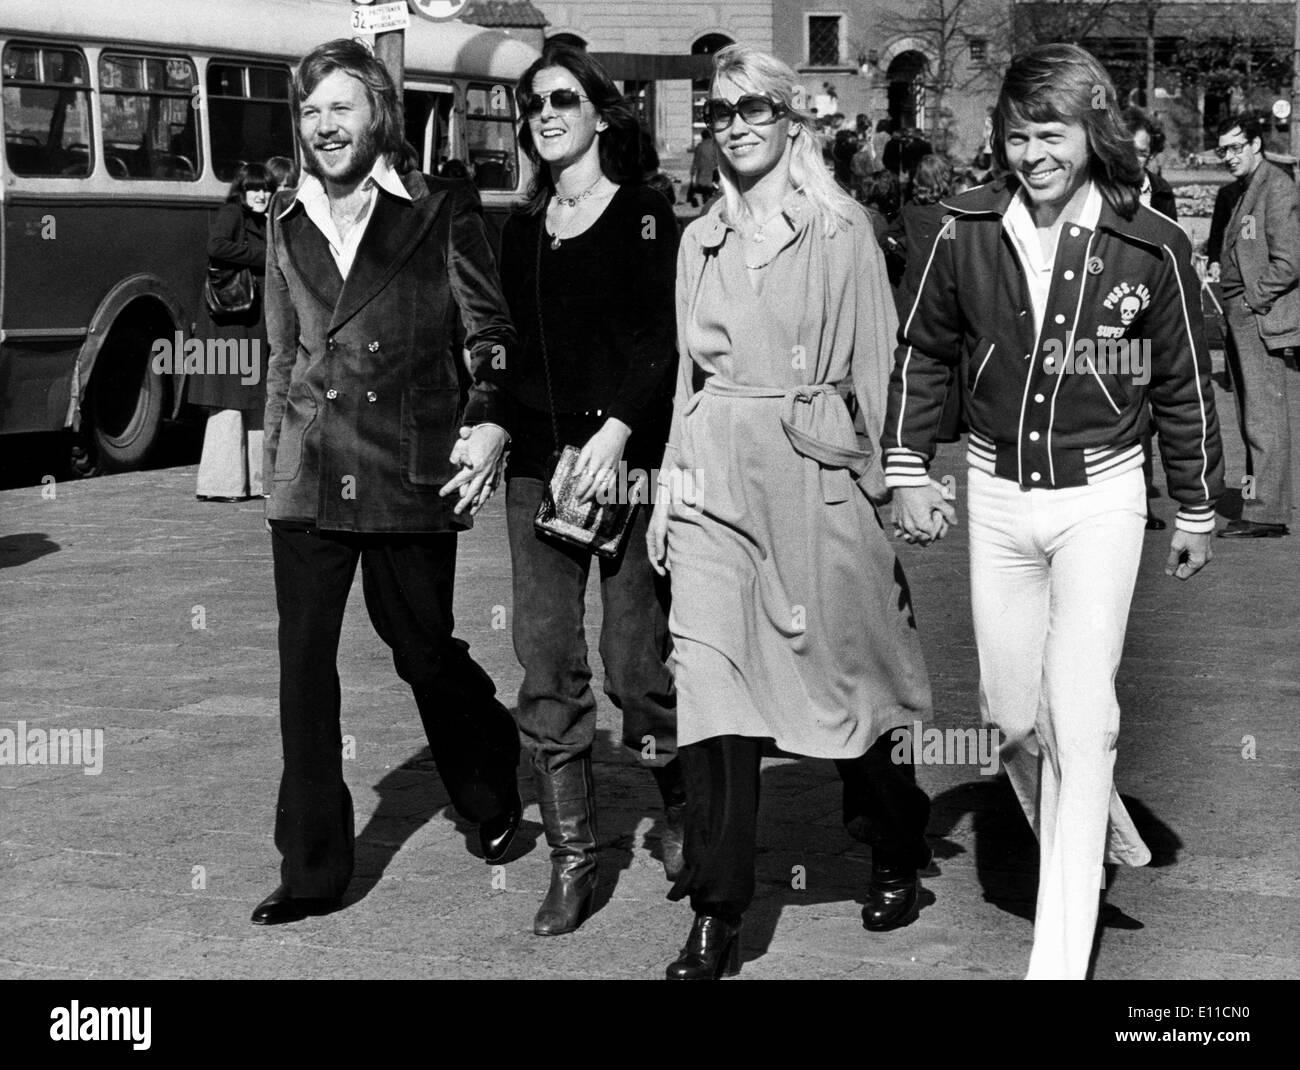 Pop group ABBA walks streets of Oslo Stock Photo